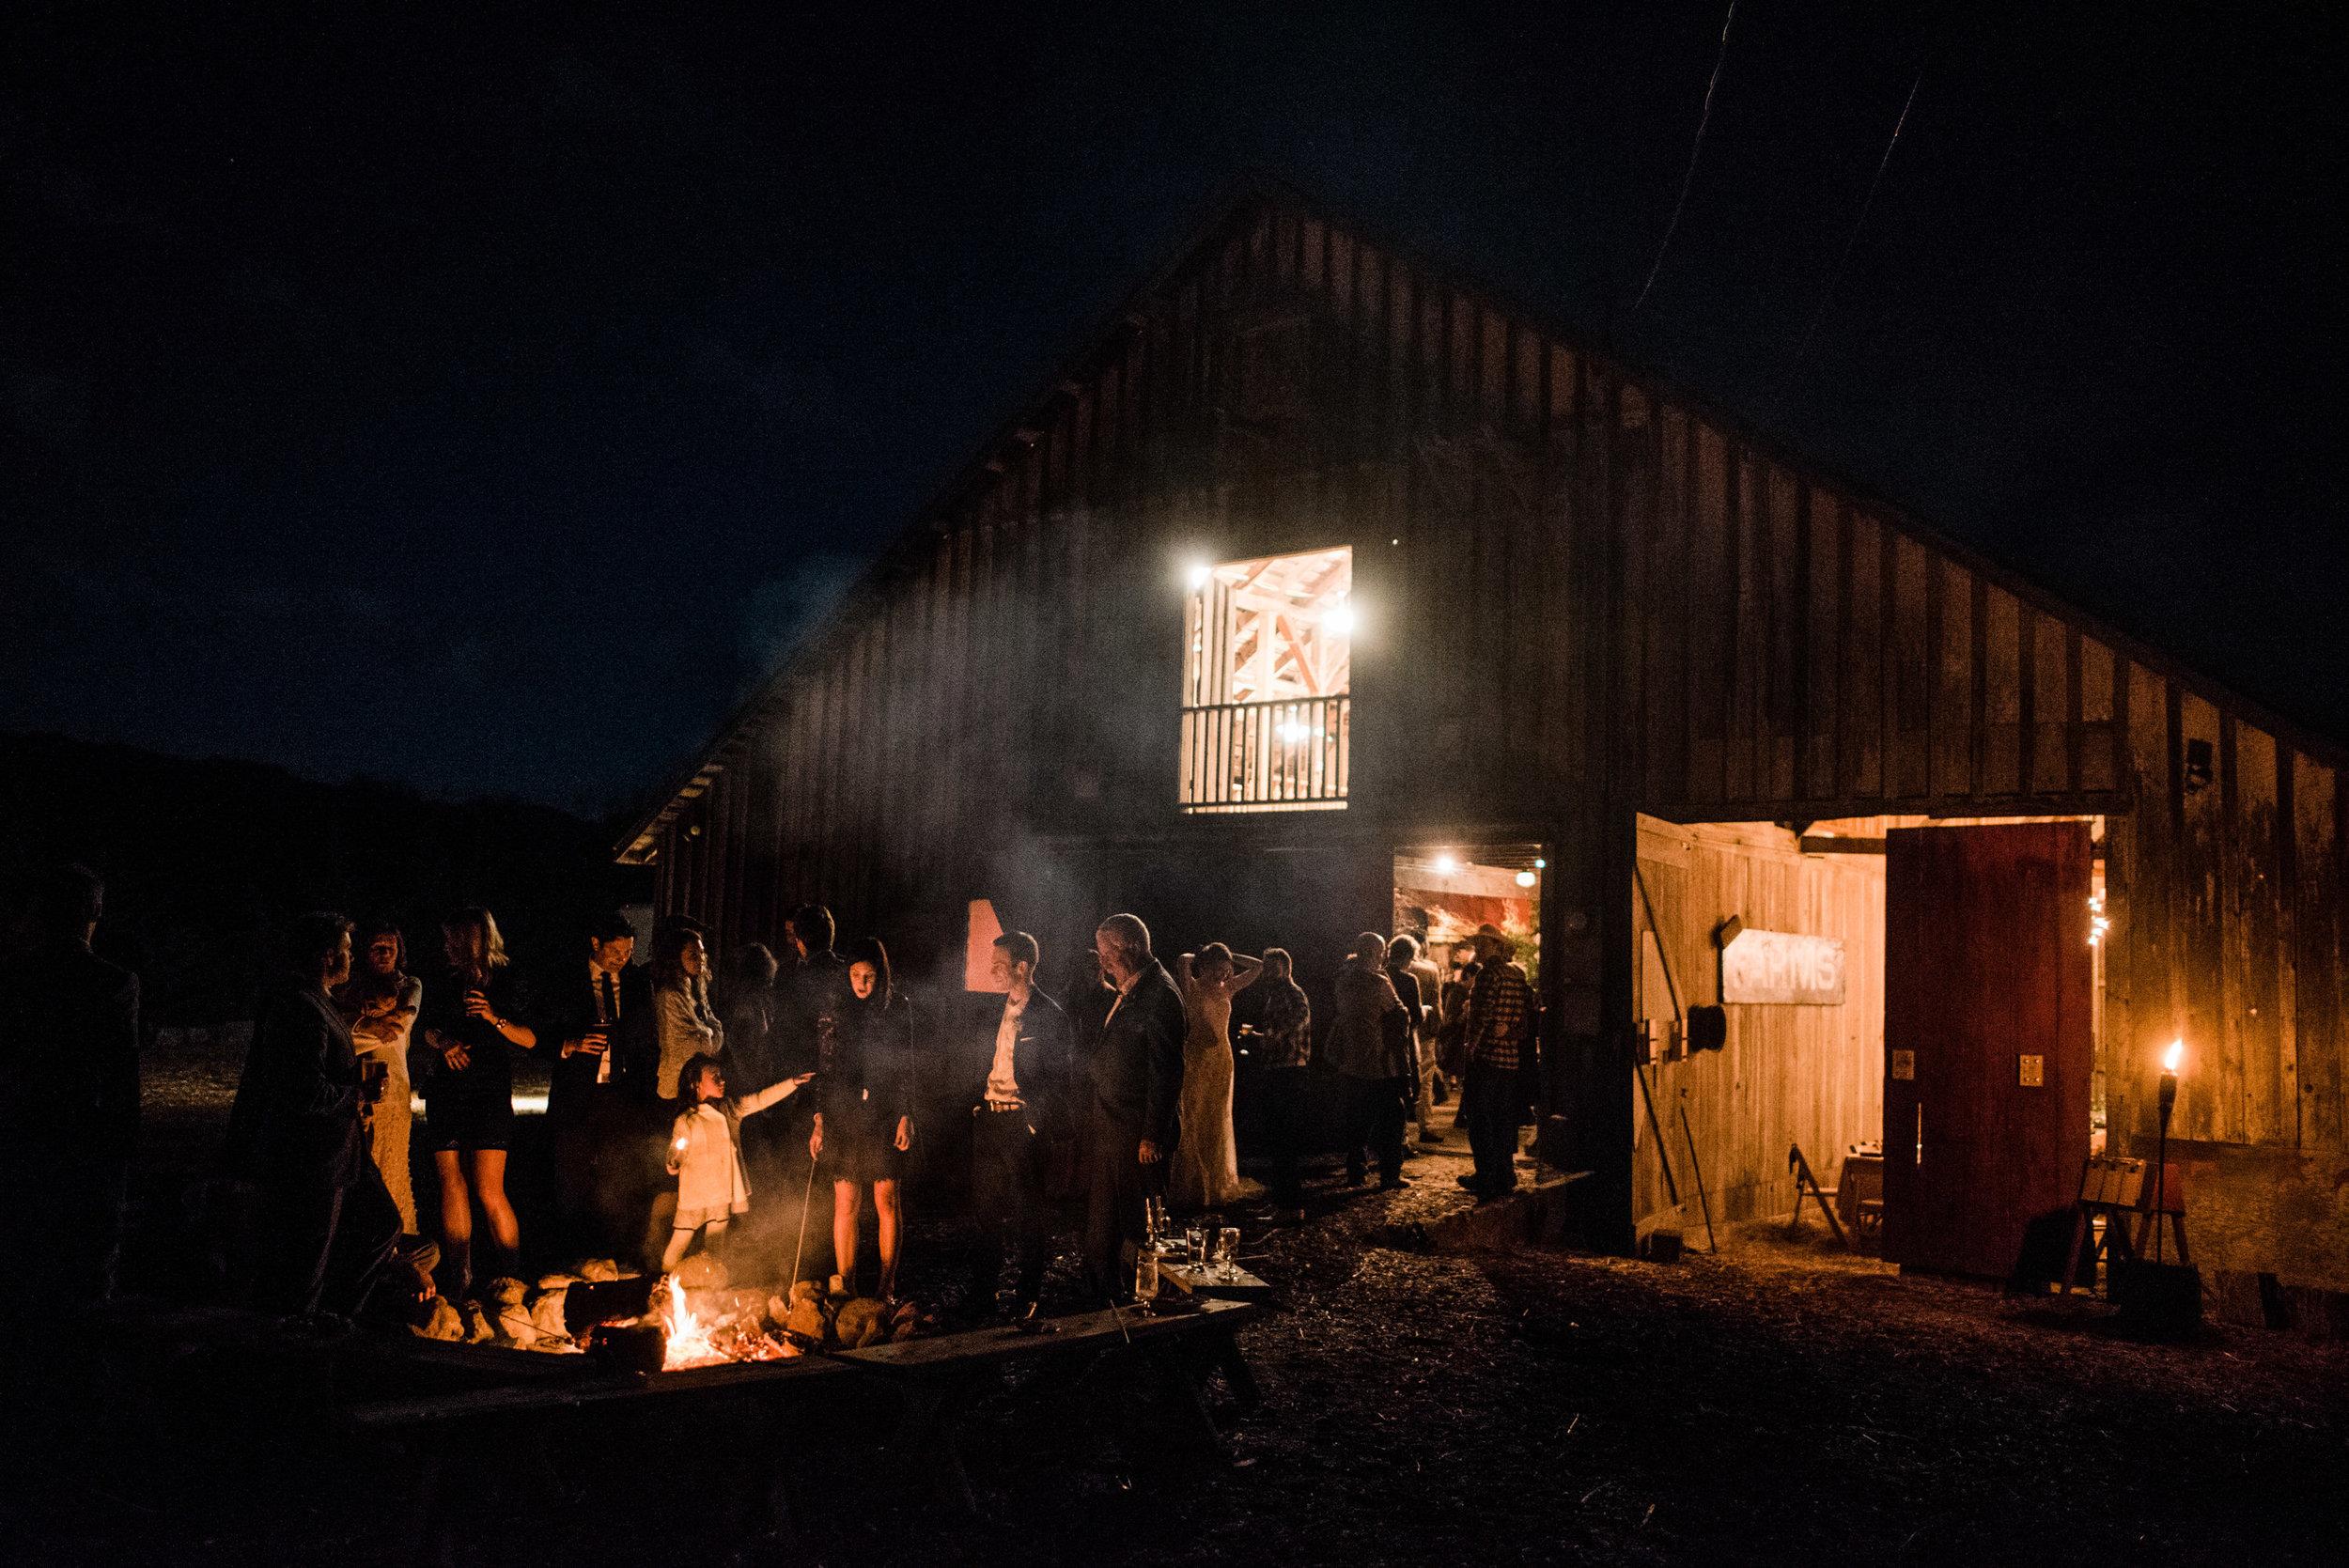 Night time outdoor bonfire at Harley Farms Pescadero wedding